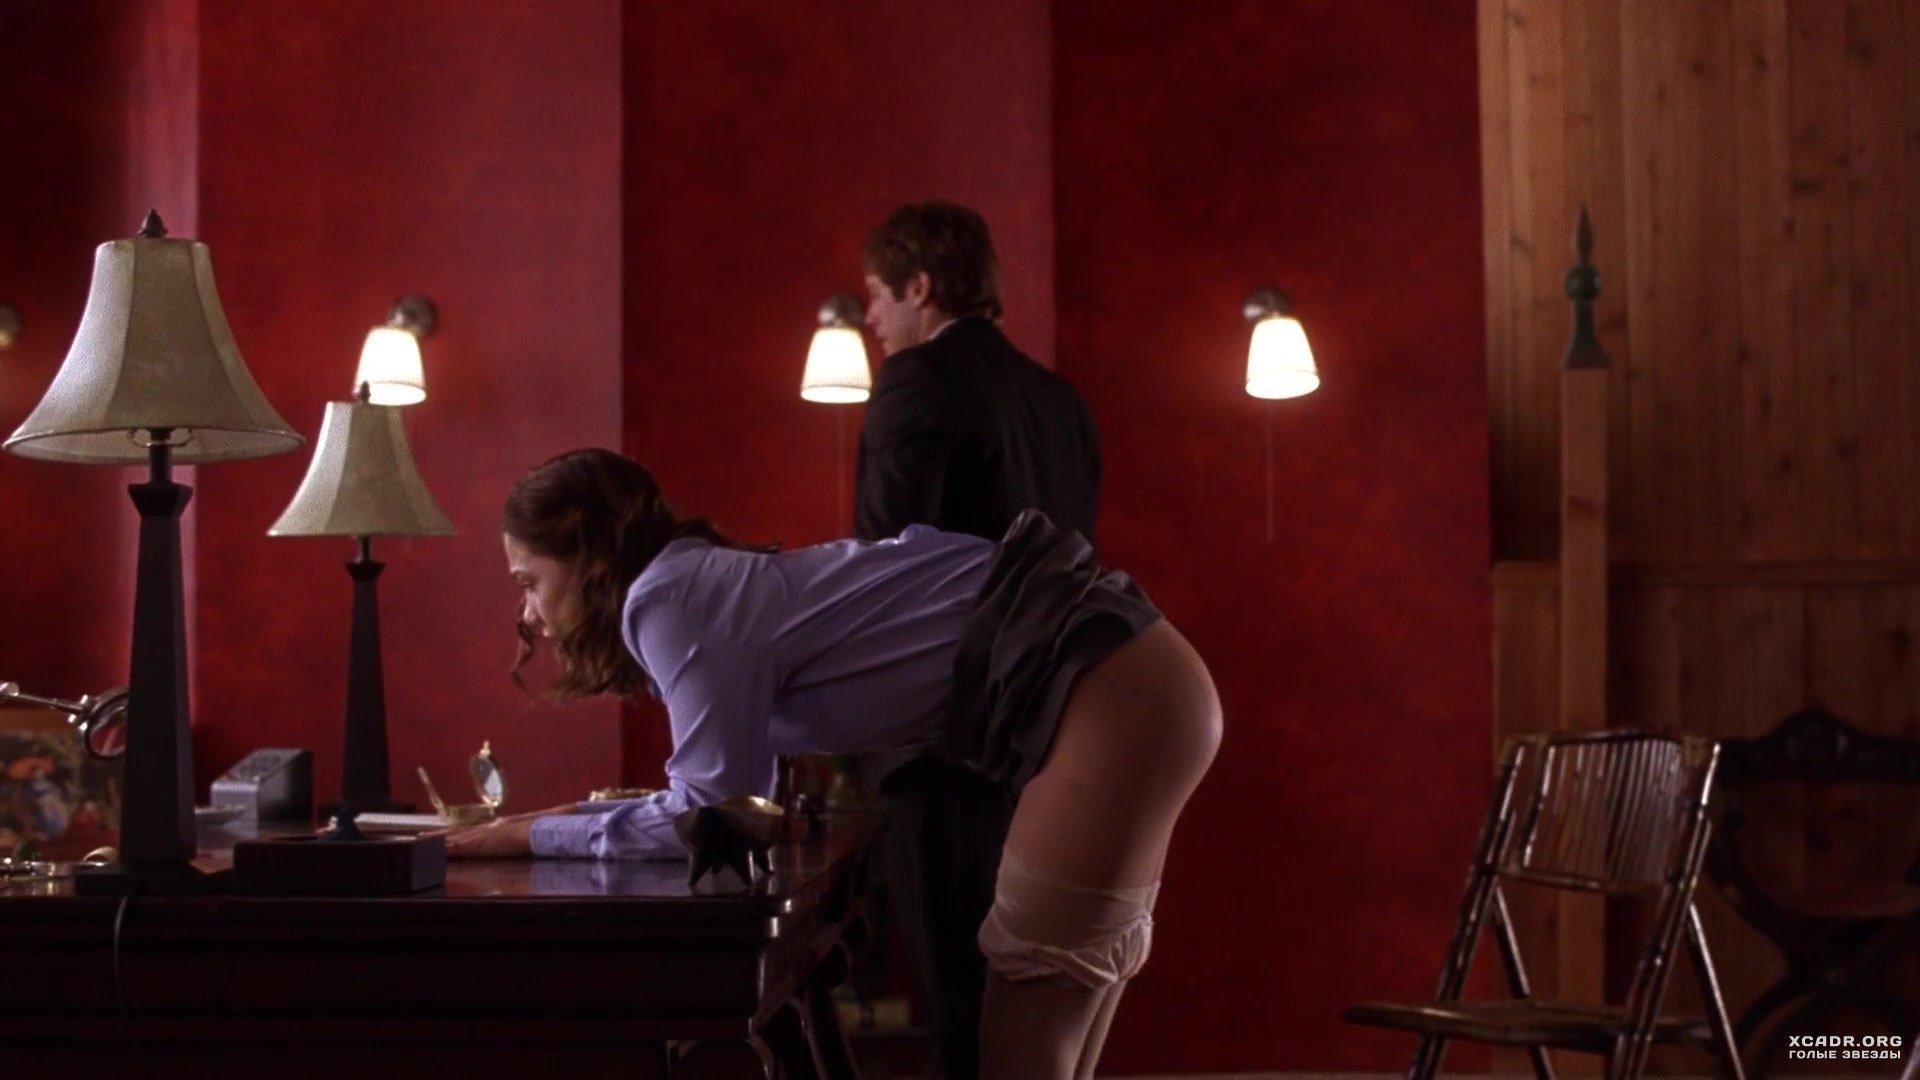 filmi-s-erotikoy-o-sekretarshah